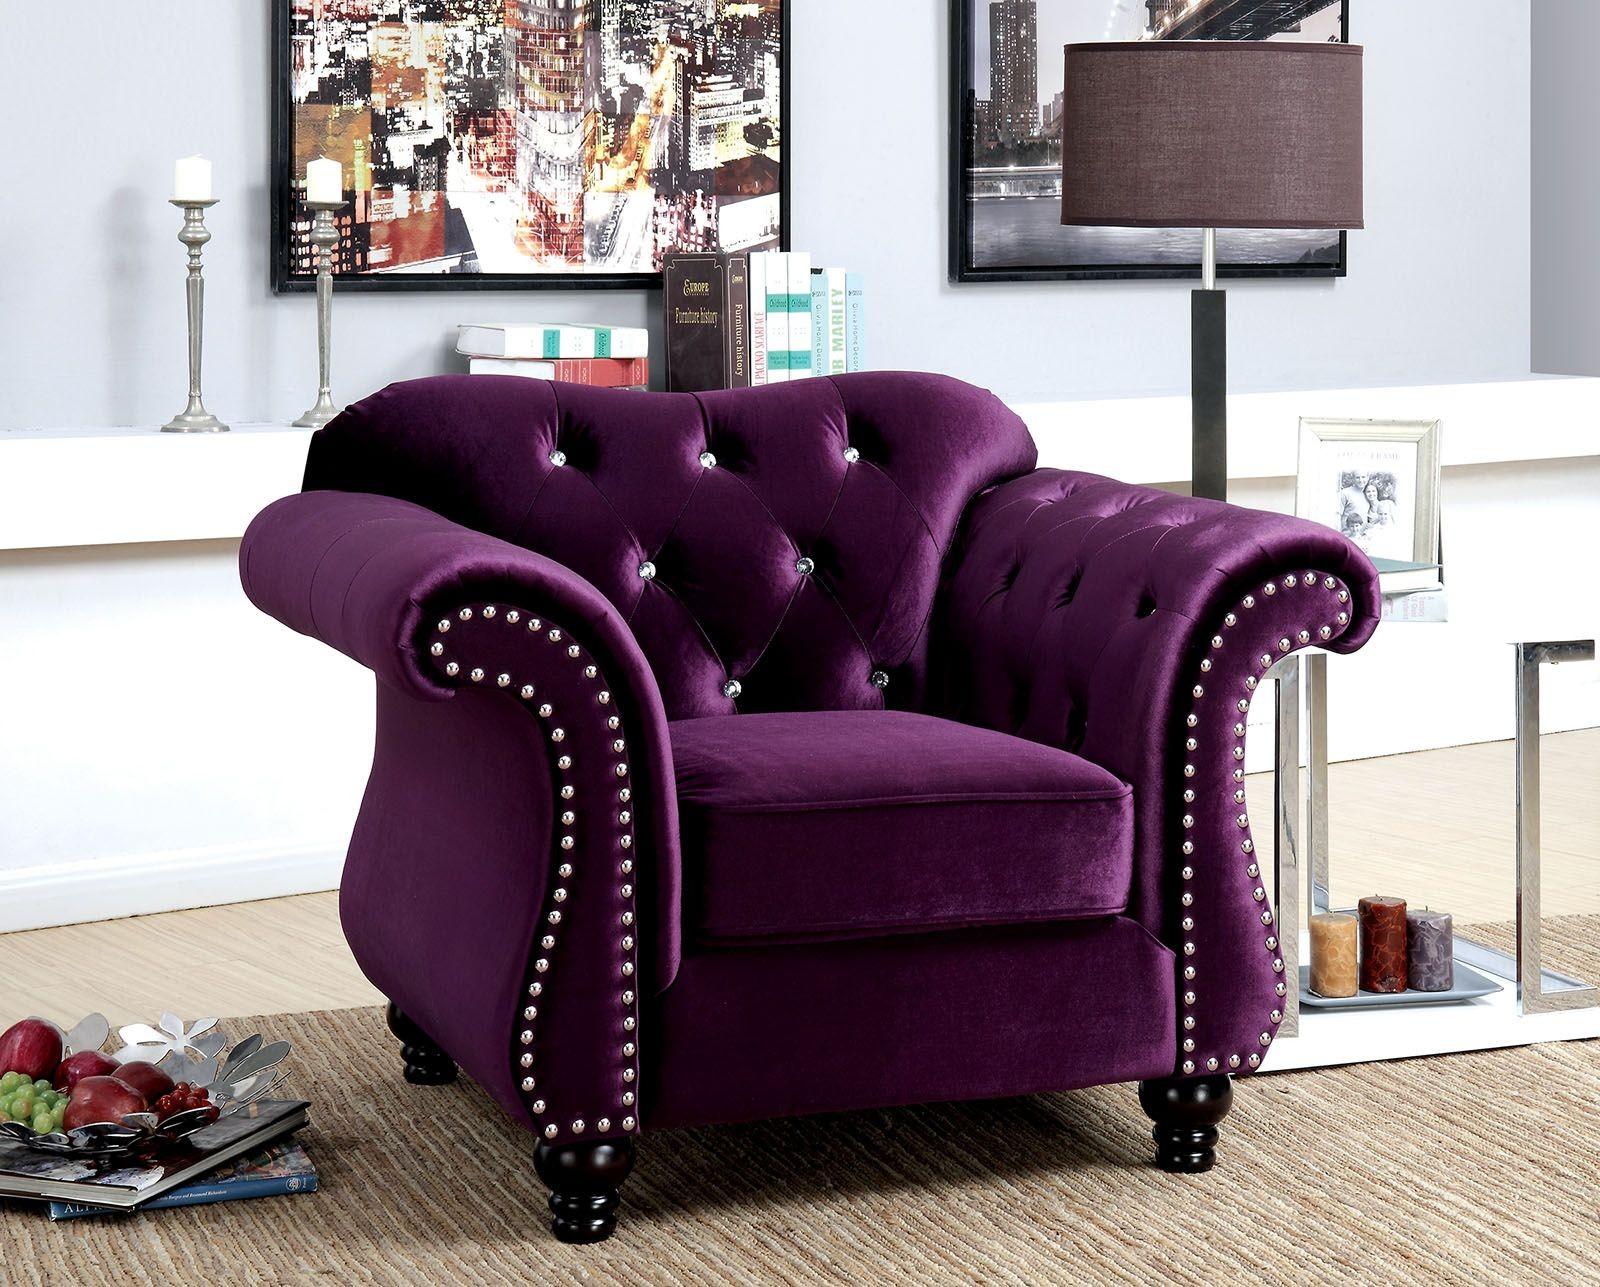 Jolanda Purple Flannelette Fabric Living Room Set Cm6159pr Sf Furniture Of America